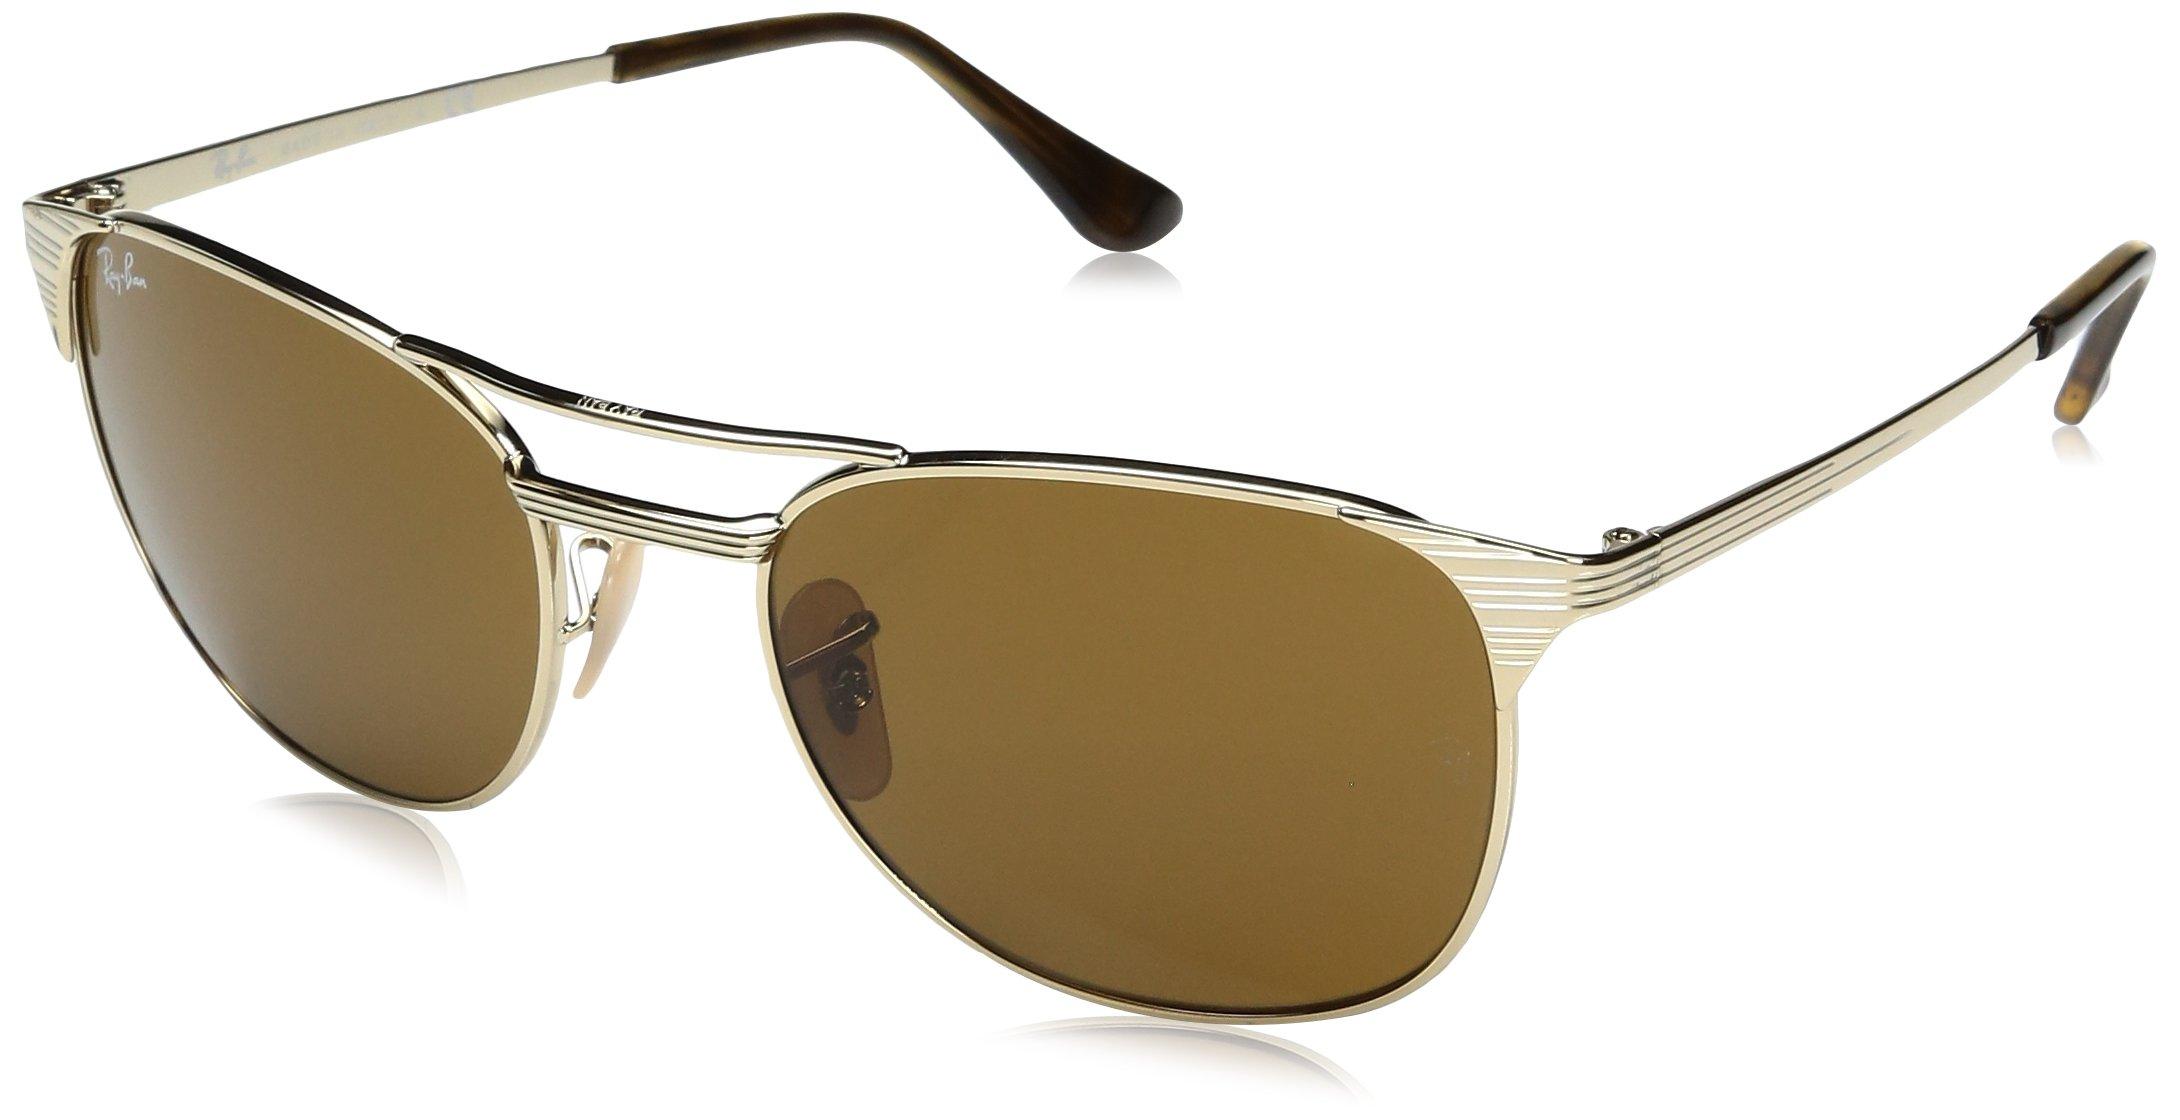 Ray-Ban Men's Metal Man Square Sunglasses, Gold/Brown, 58 mm